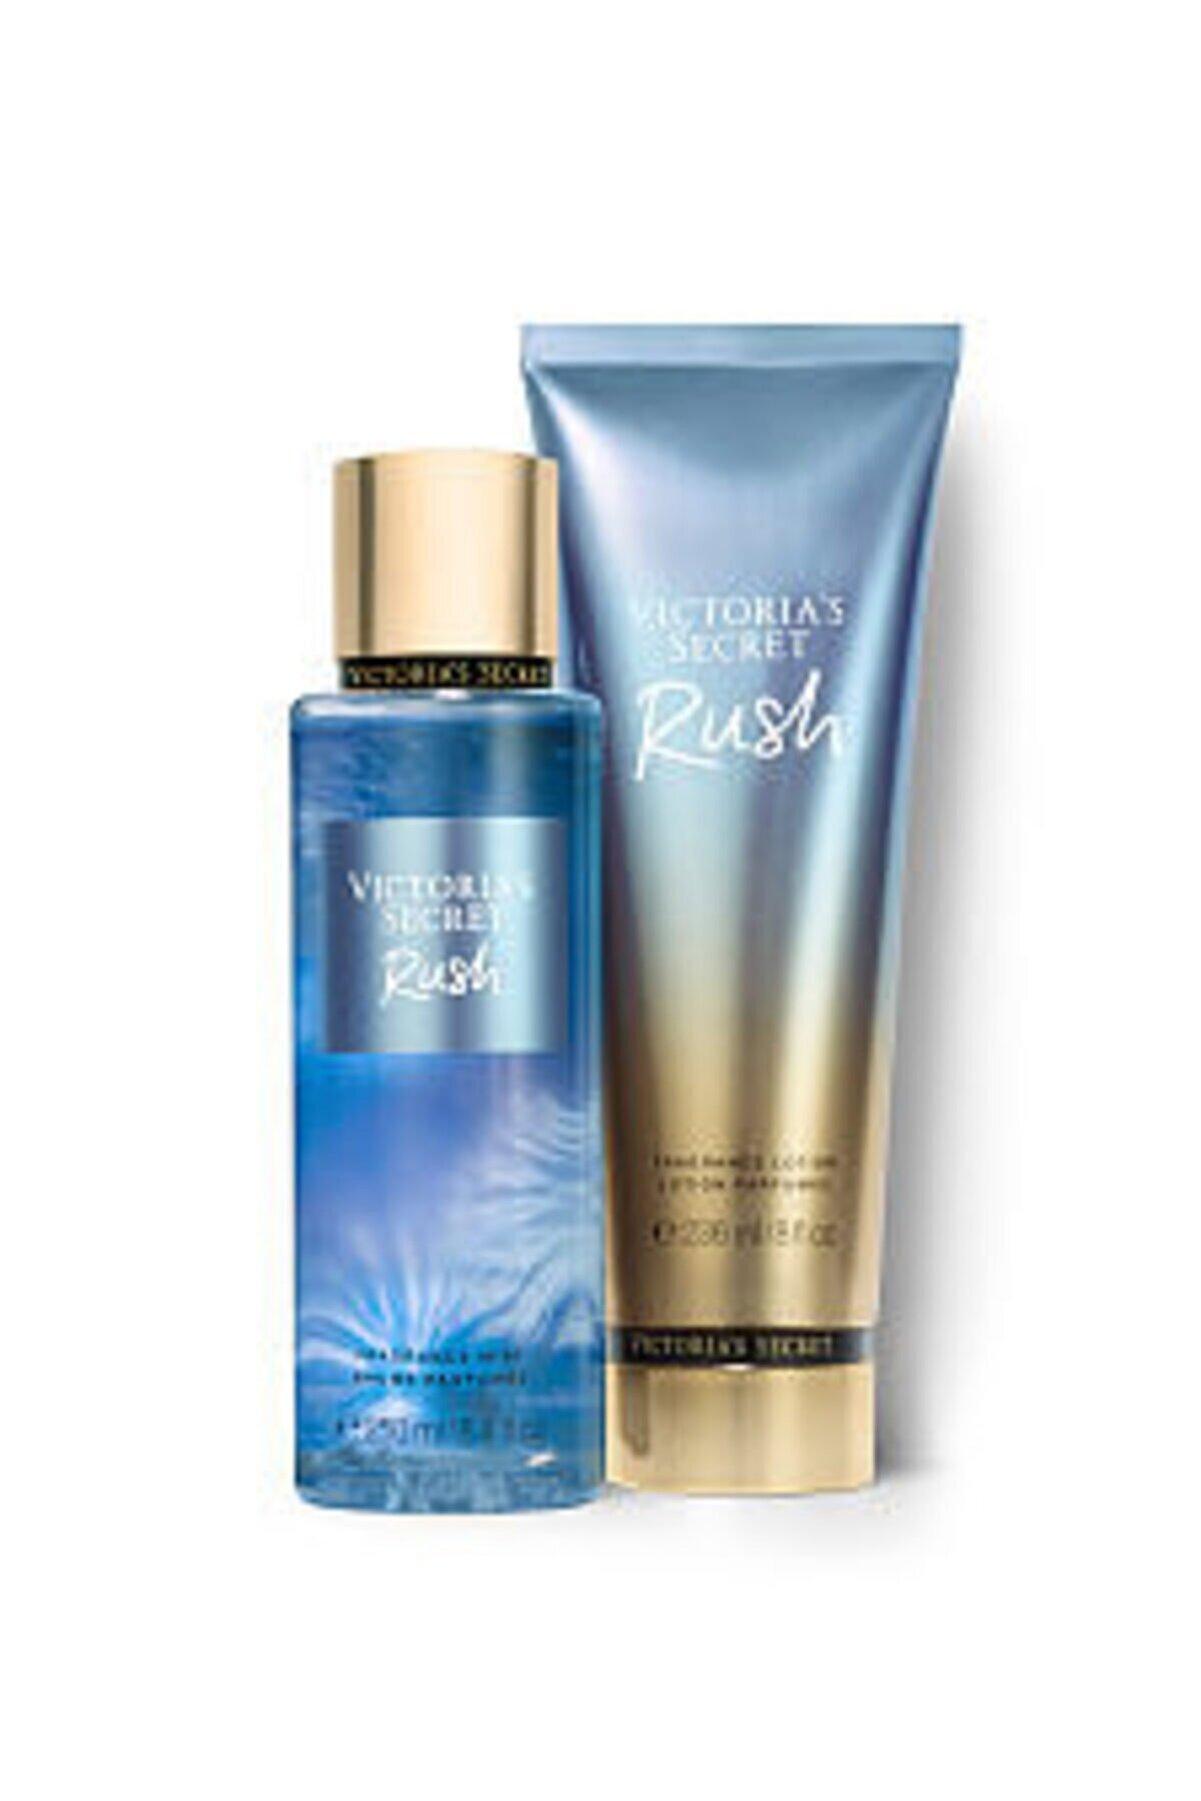 Victoria's Secret Rush New Collection Vücut Spreyi,vücut Losyonu 2 Li Set